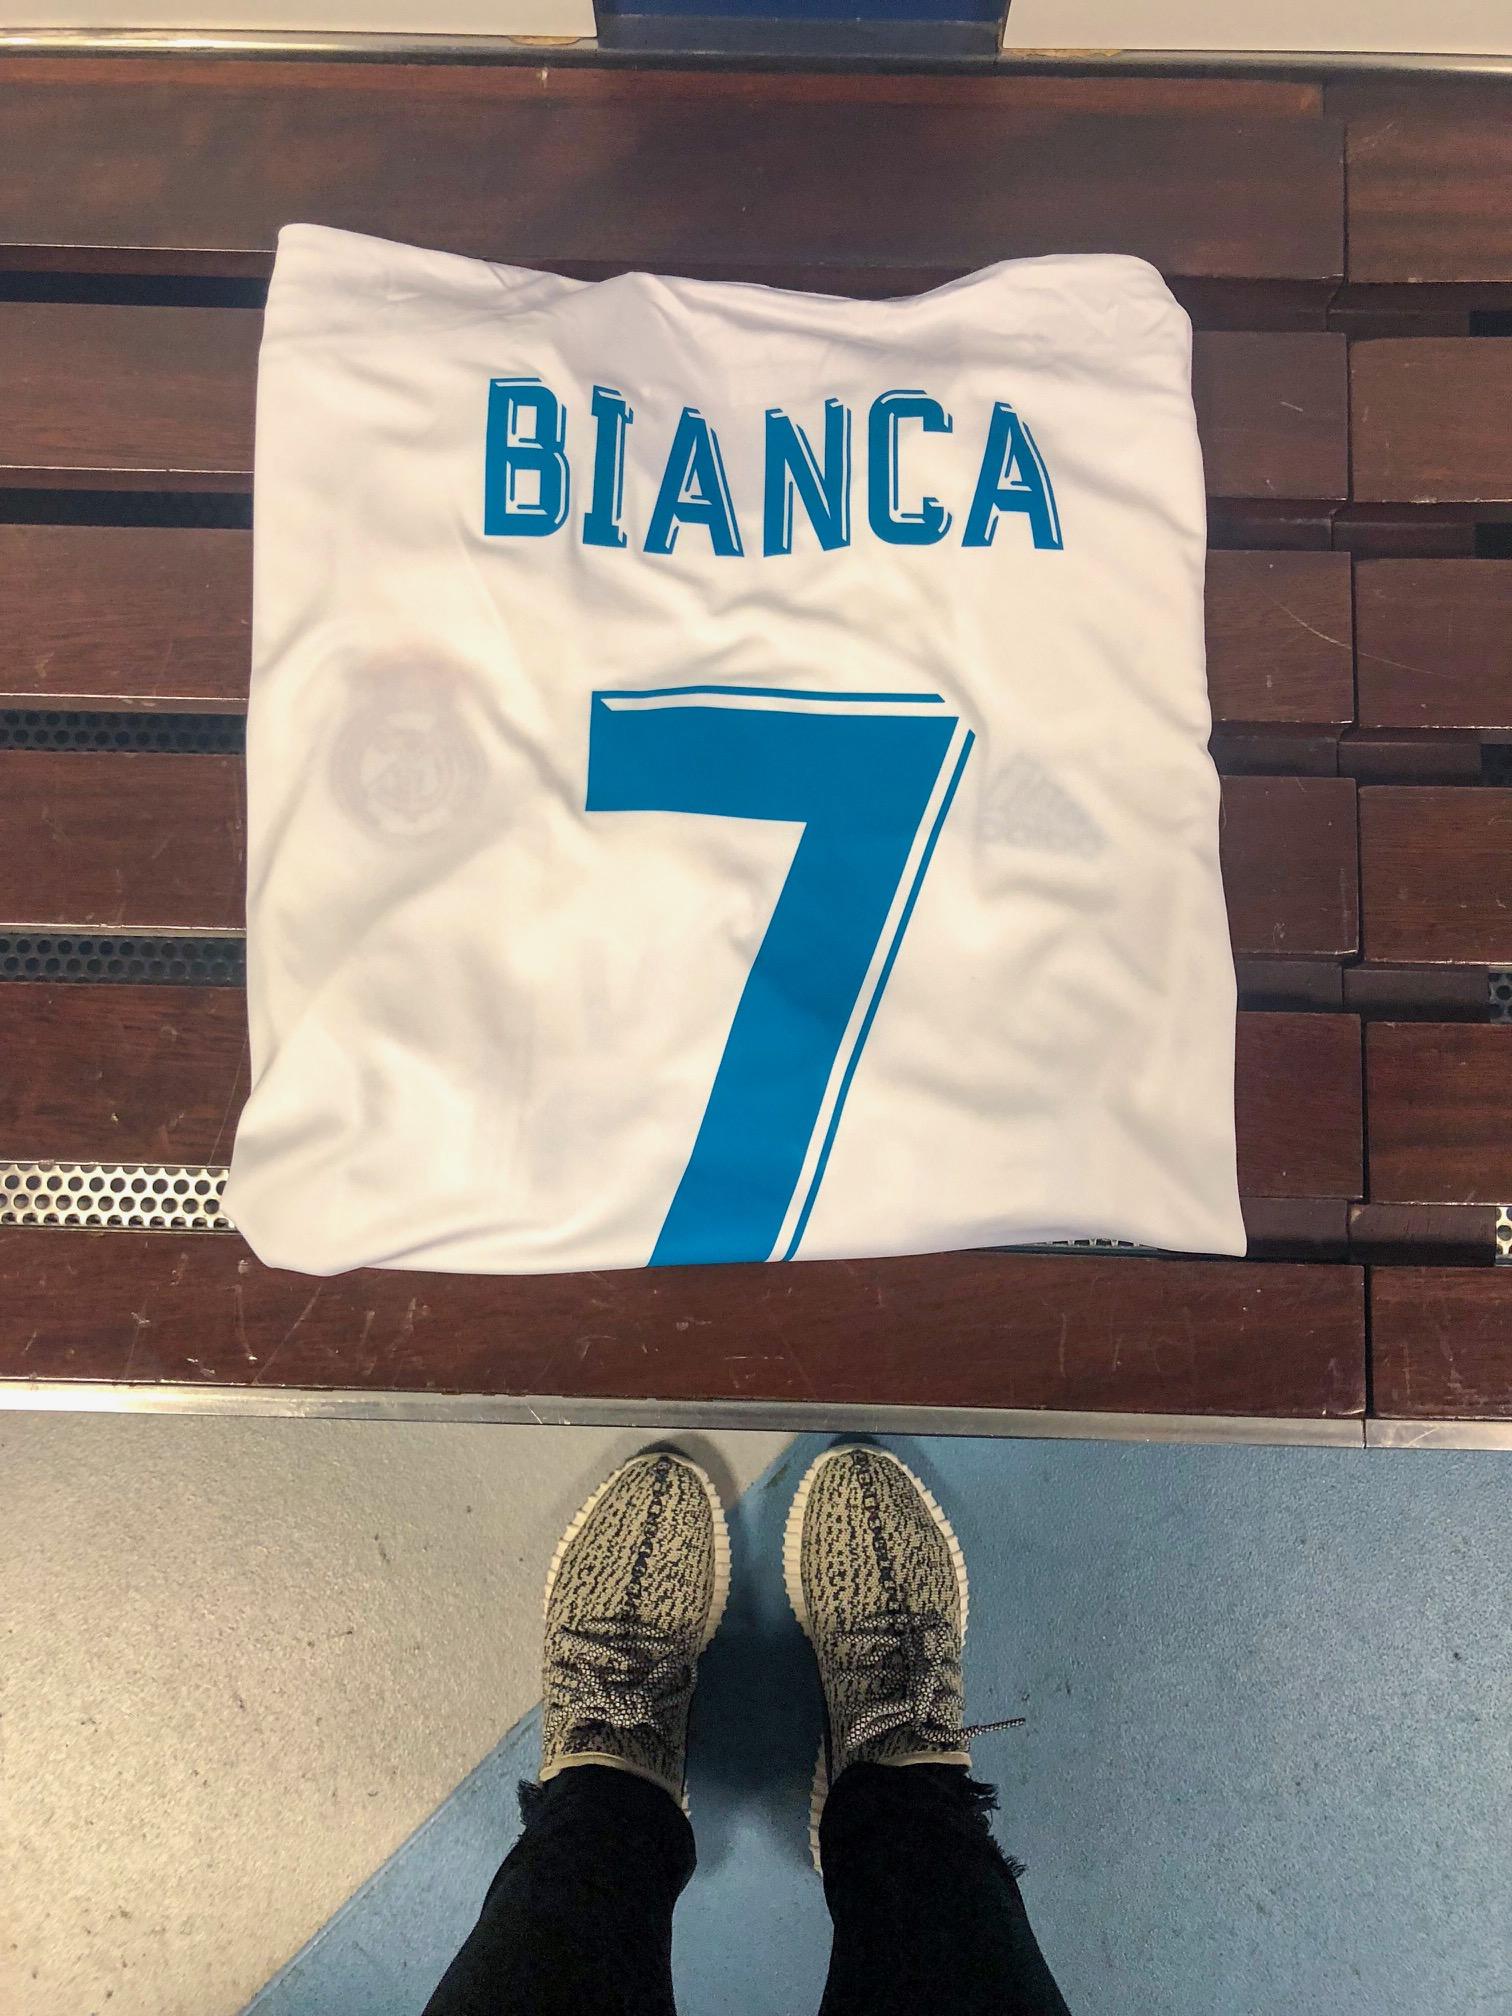 Santiago Bernabeu Stadium - Madrid Spain